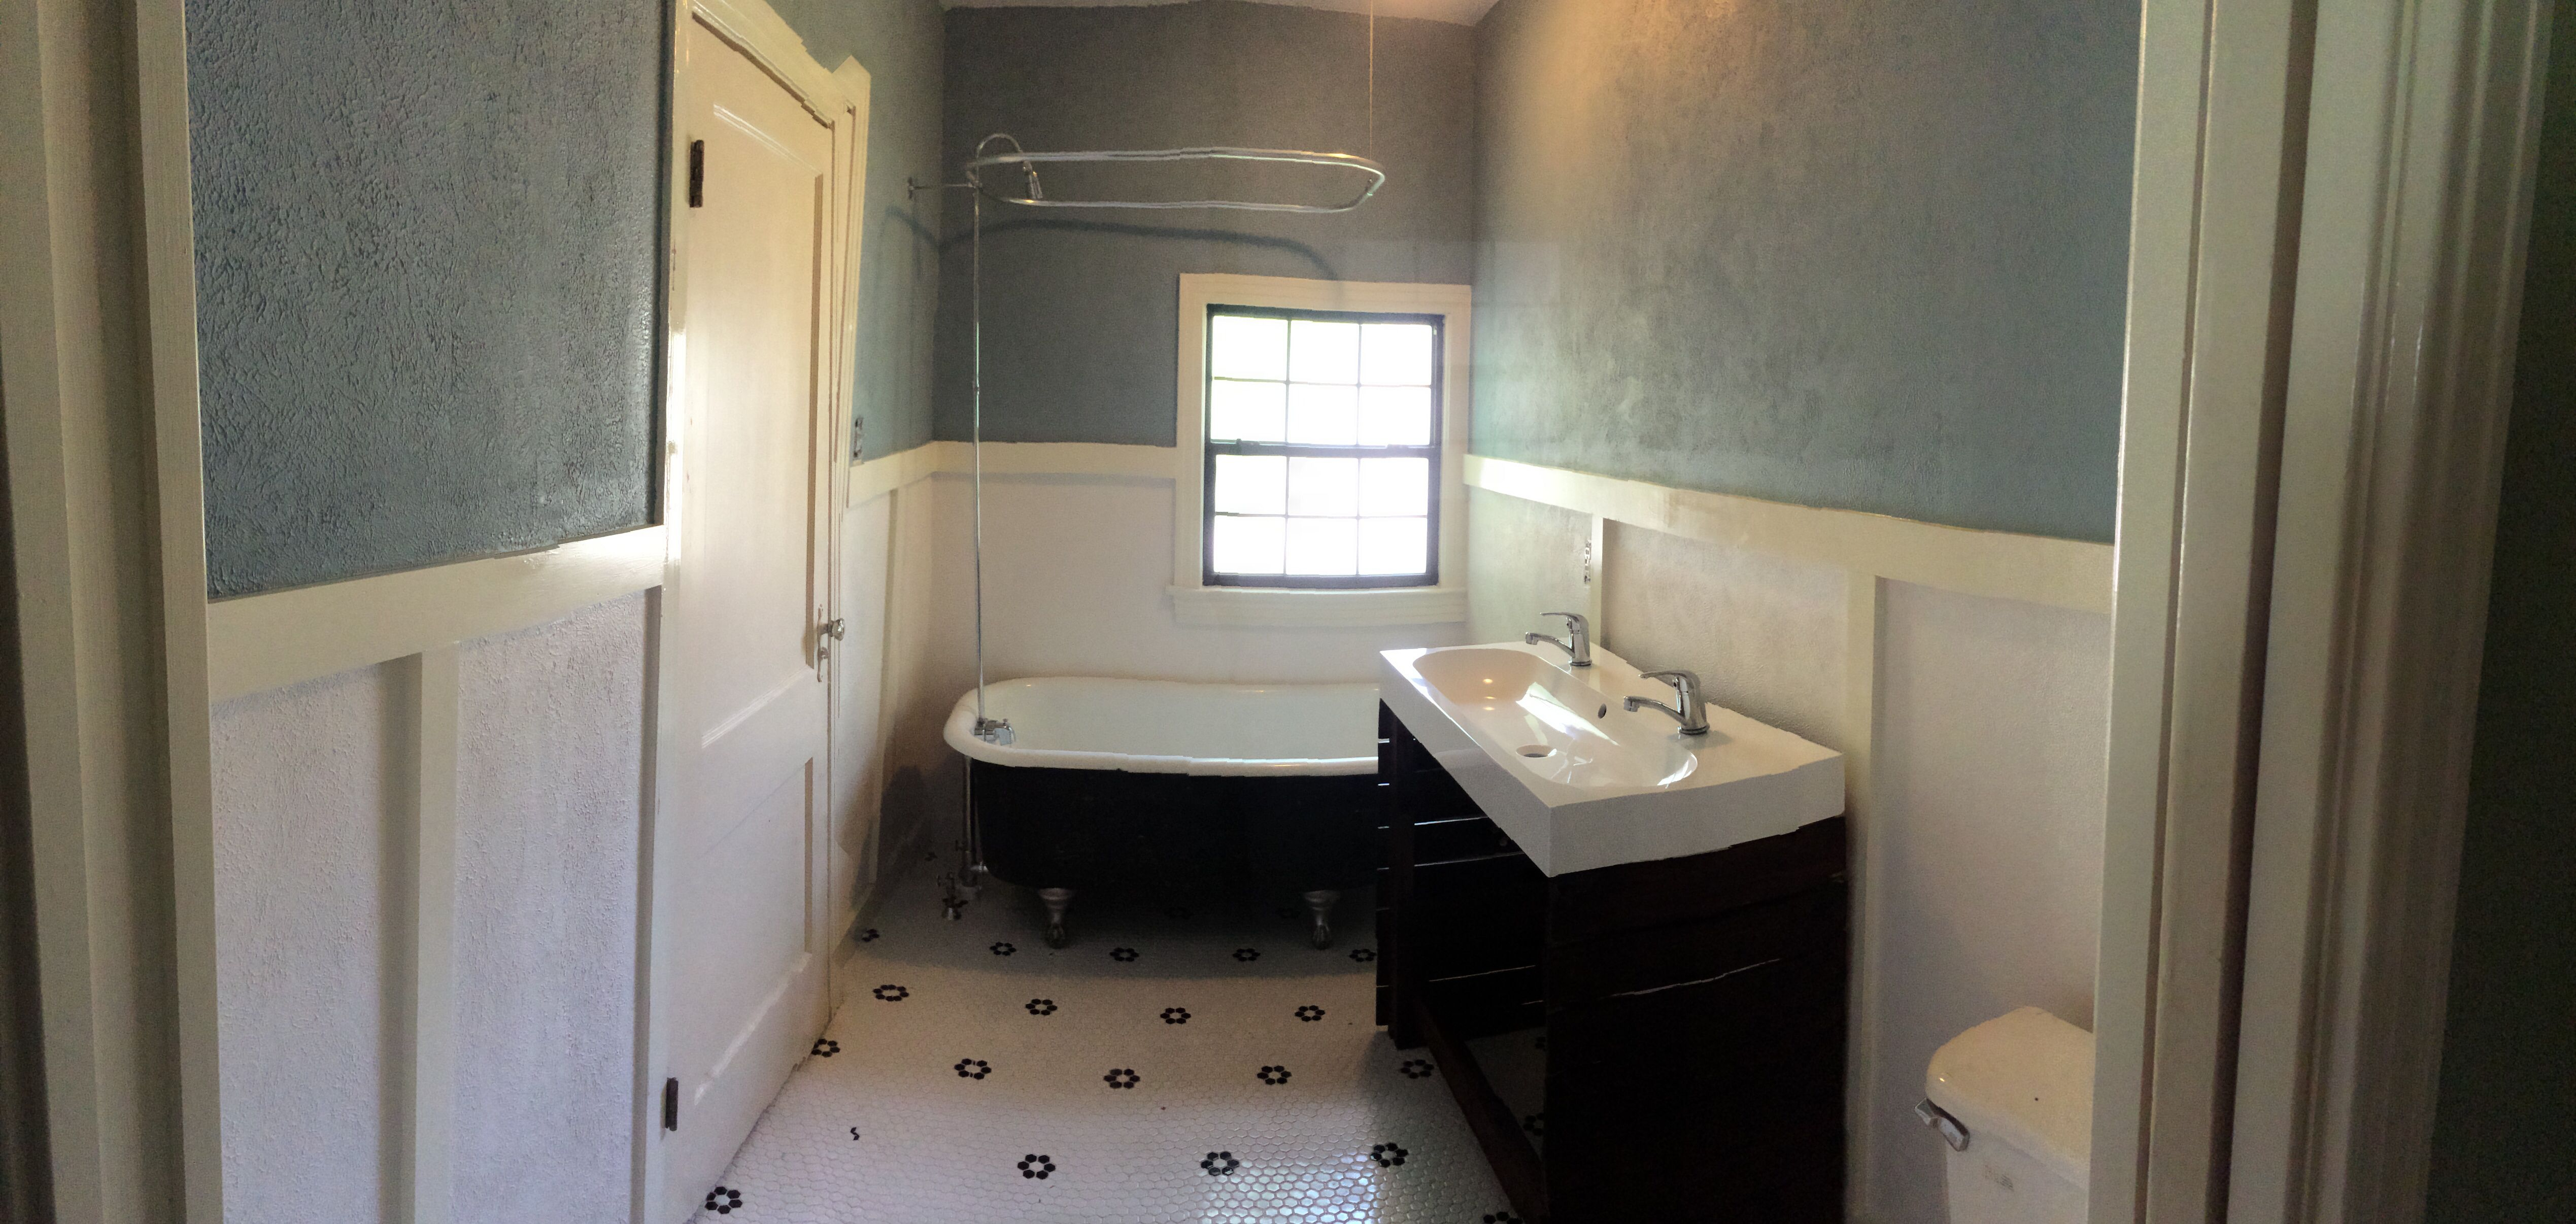 S Bathroom Remodel Chalkboard Painted Claw Foot Tub Black And - 1940s bathroom remodel